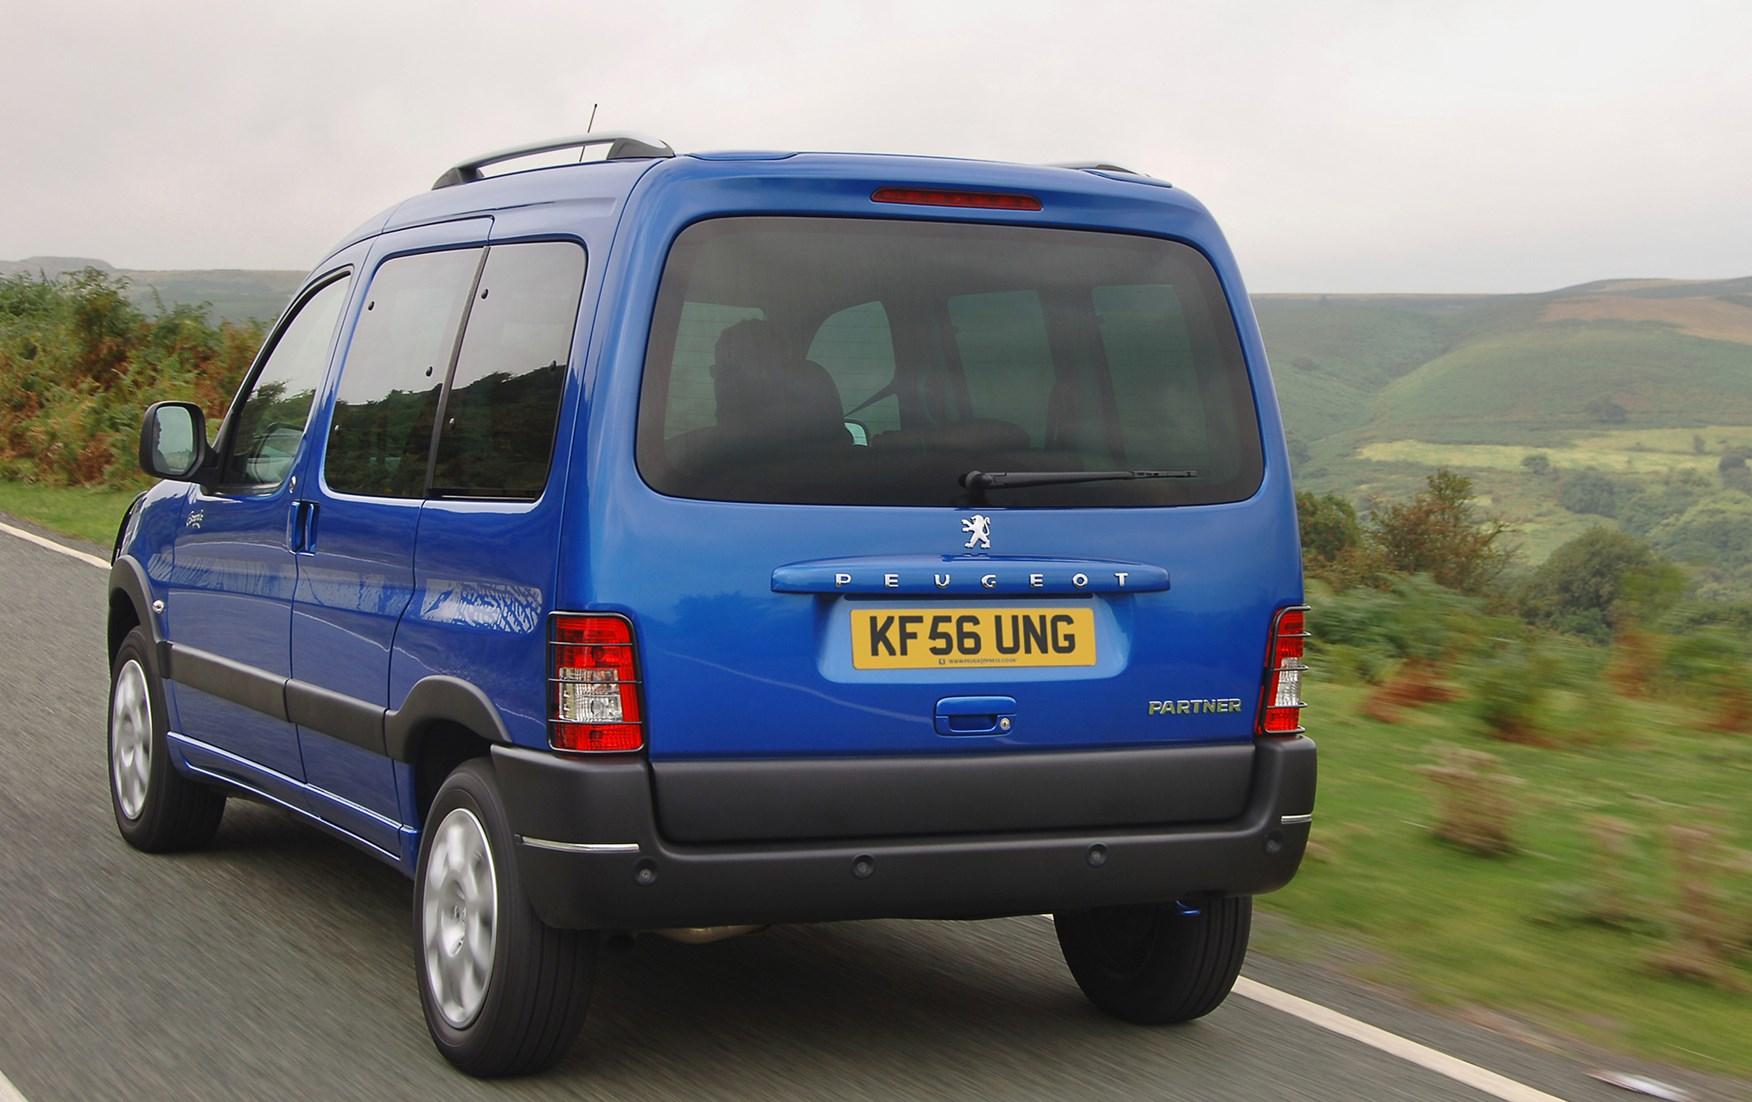 peugeot partner combi estate (2001 - 2010) driving & performance